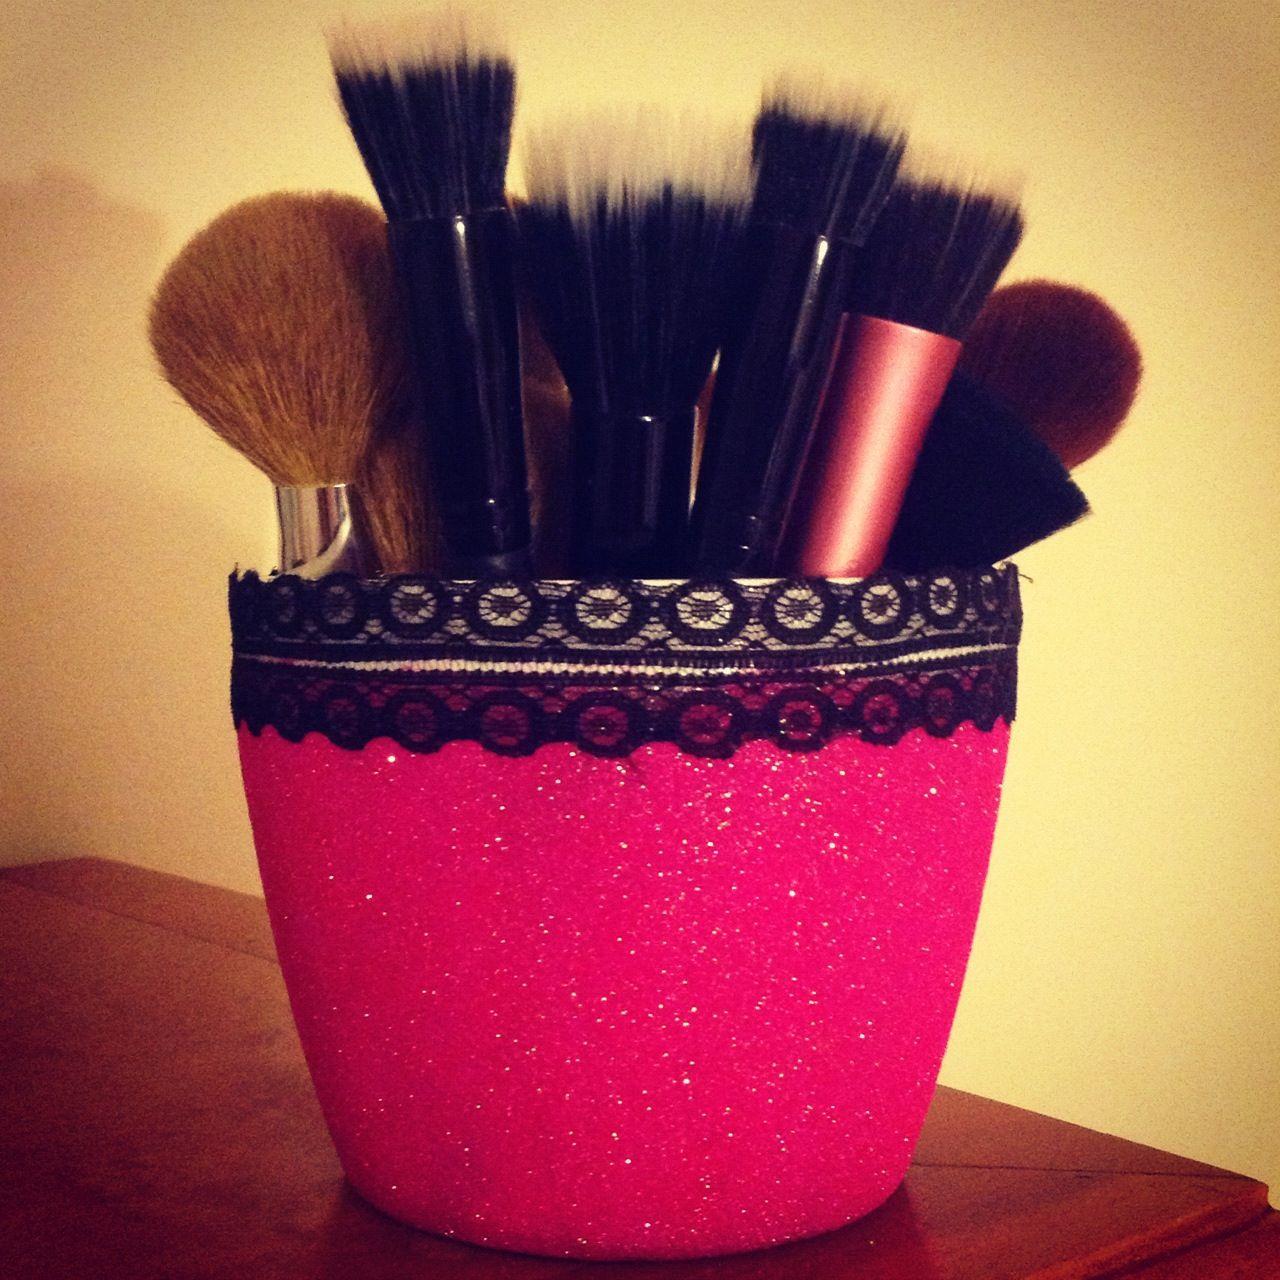 Brush holder I made. Hot pink glitter & black lace Cake